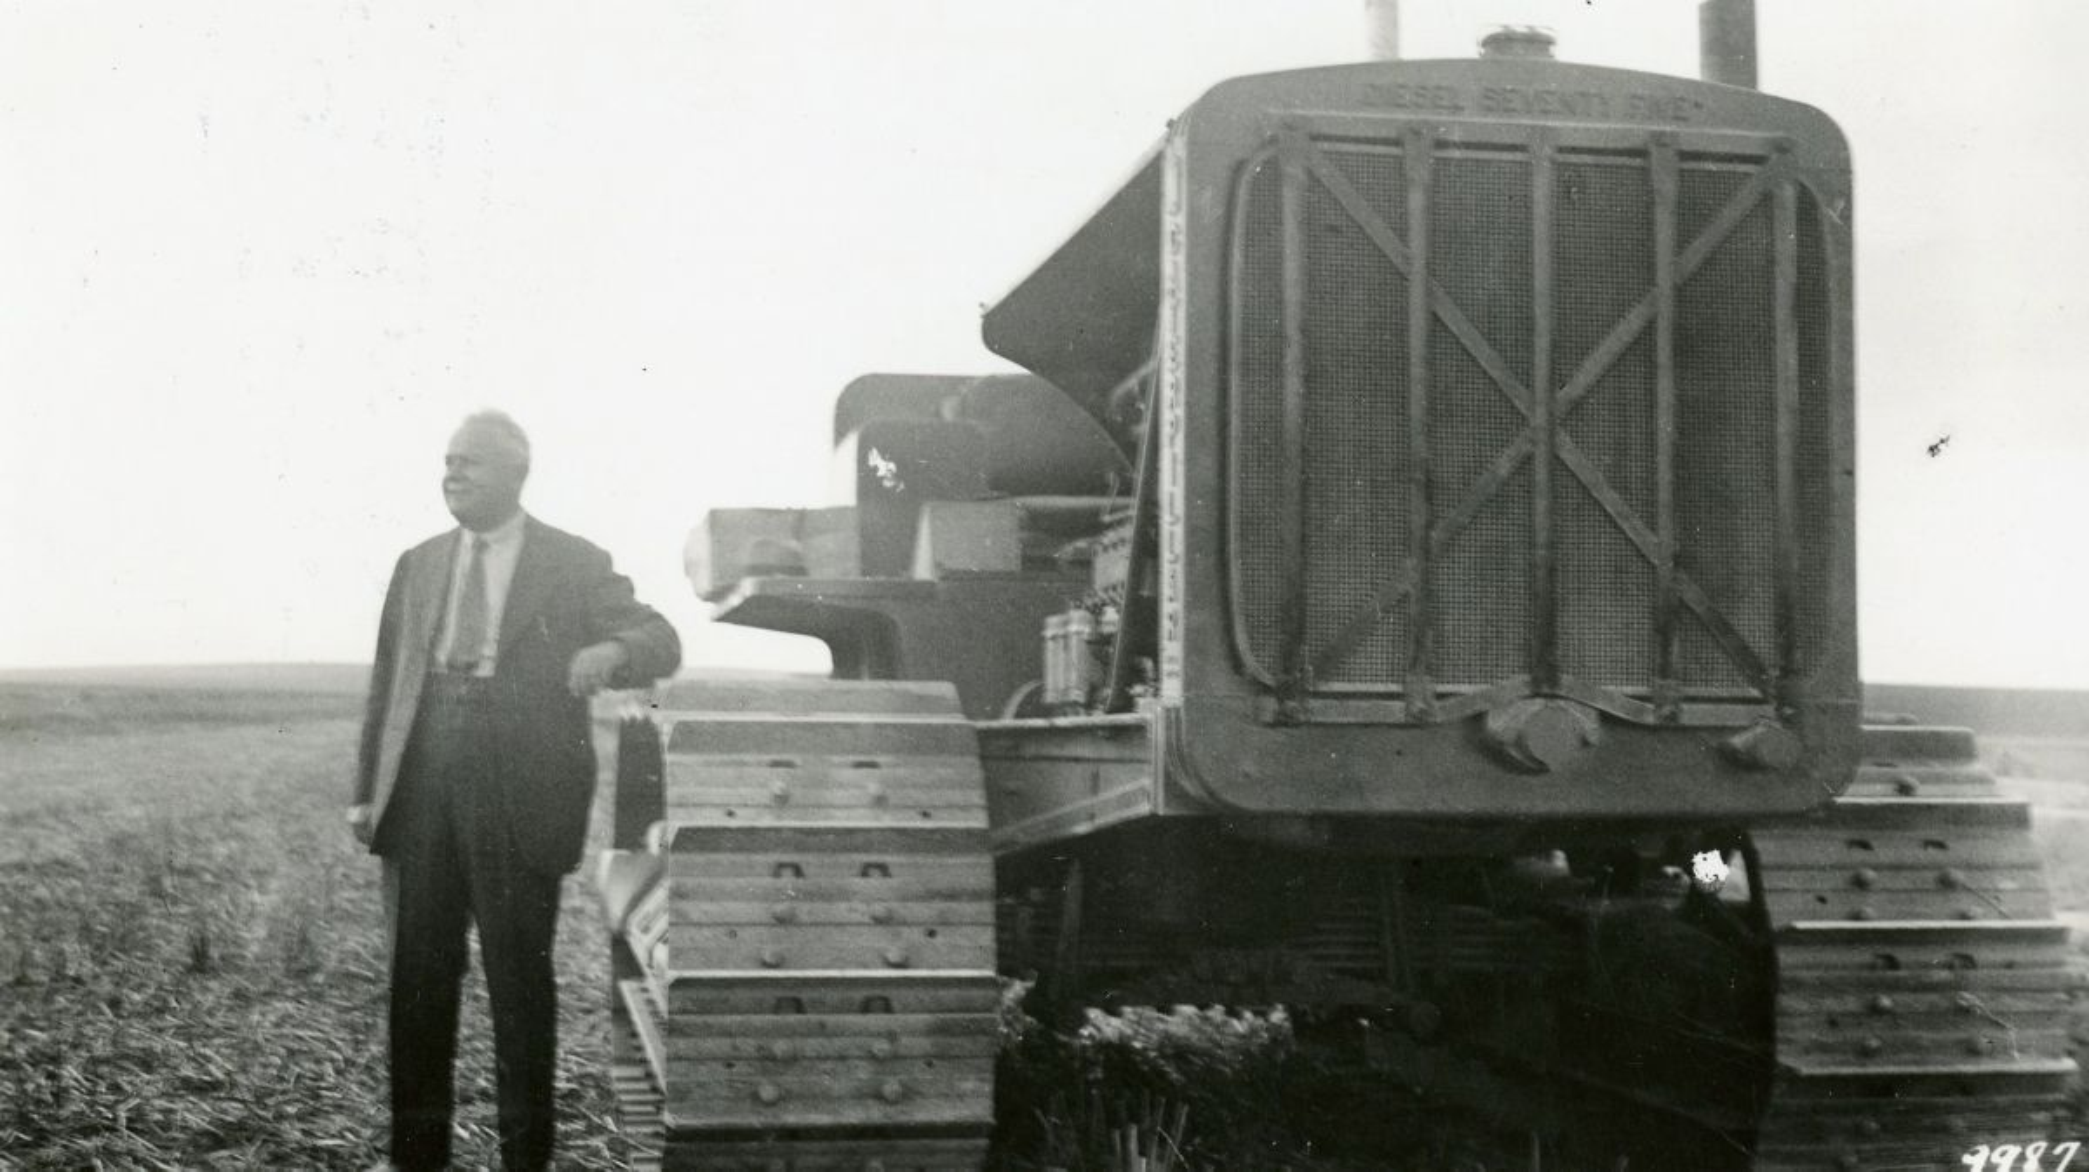 First Caterpillar diesel tractor sold in Africa, 1933.